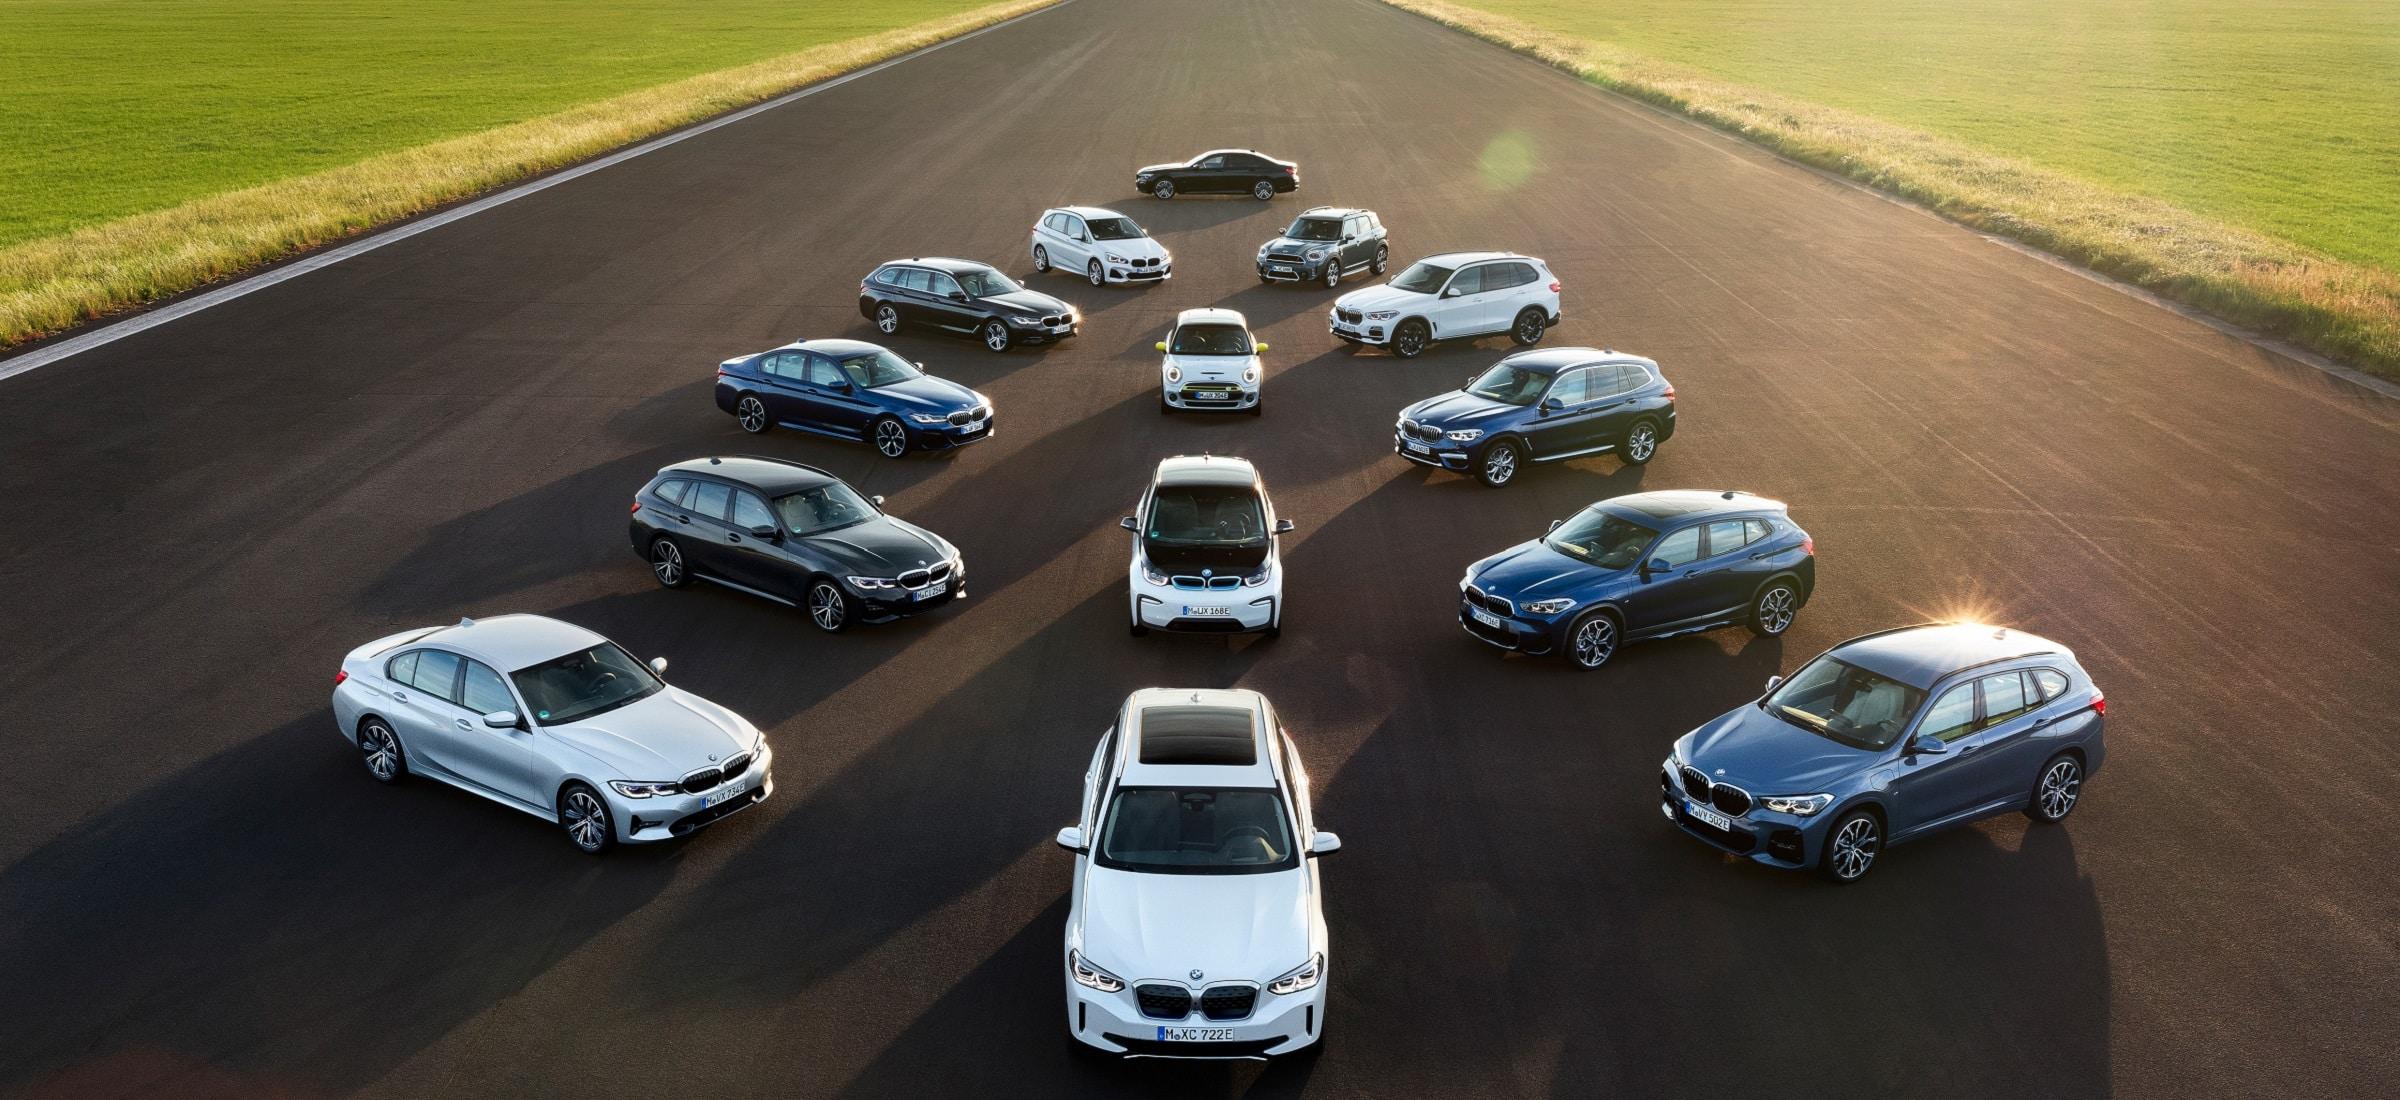 BMW Flotte